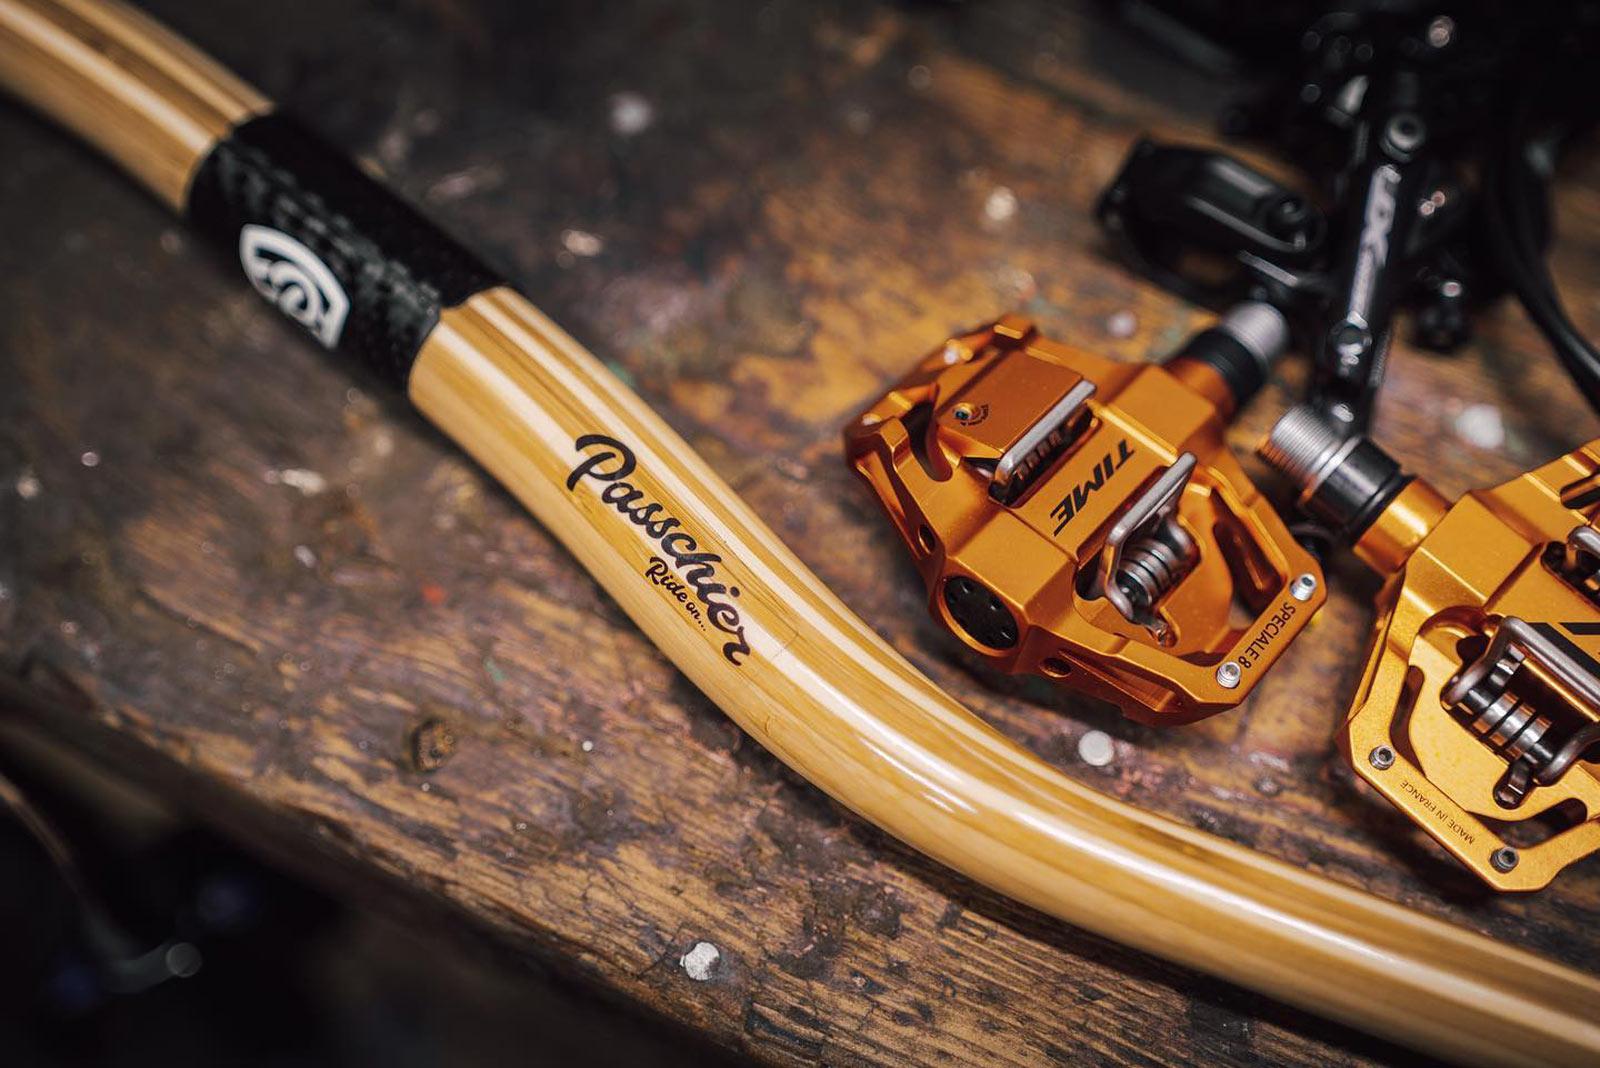 passchier gump bamboo handlebar 31.8mm clamp carbon fibre region